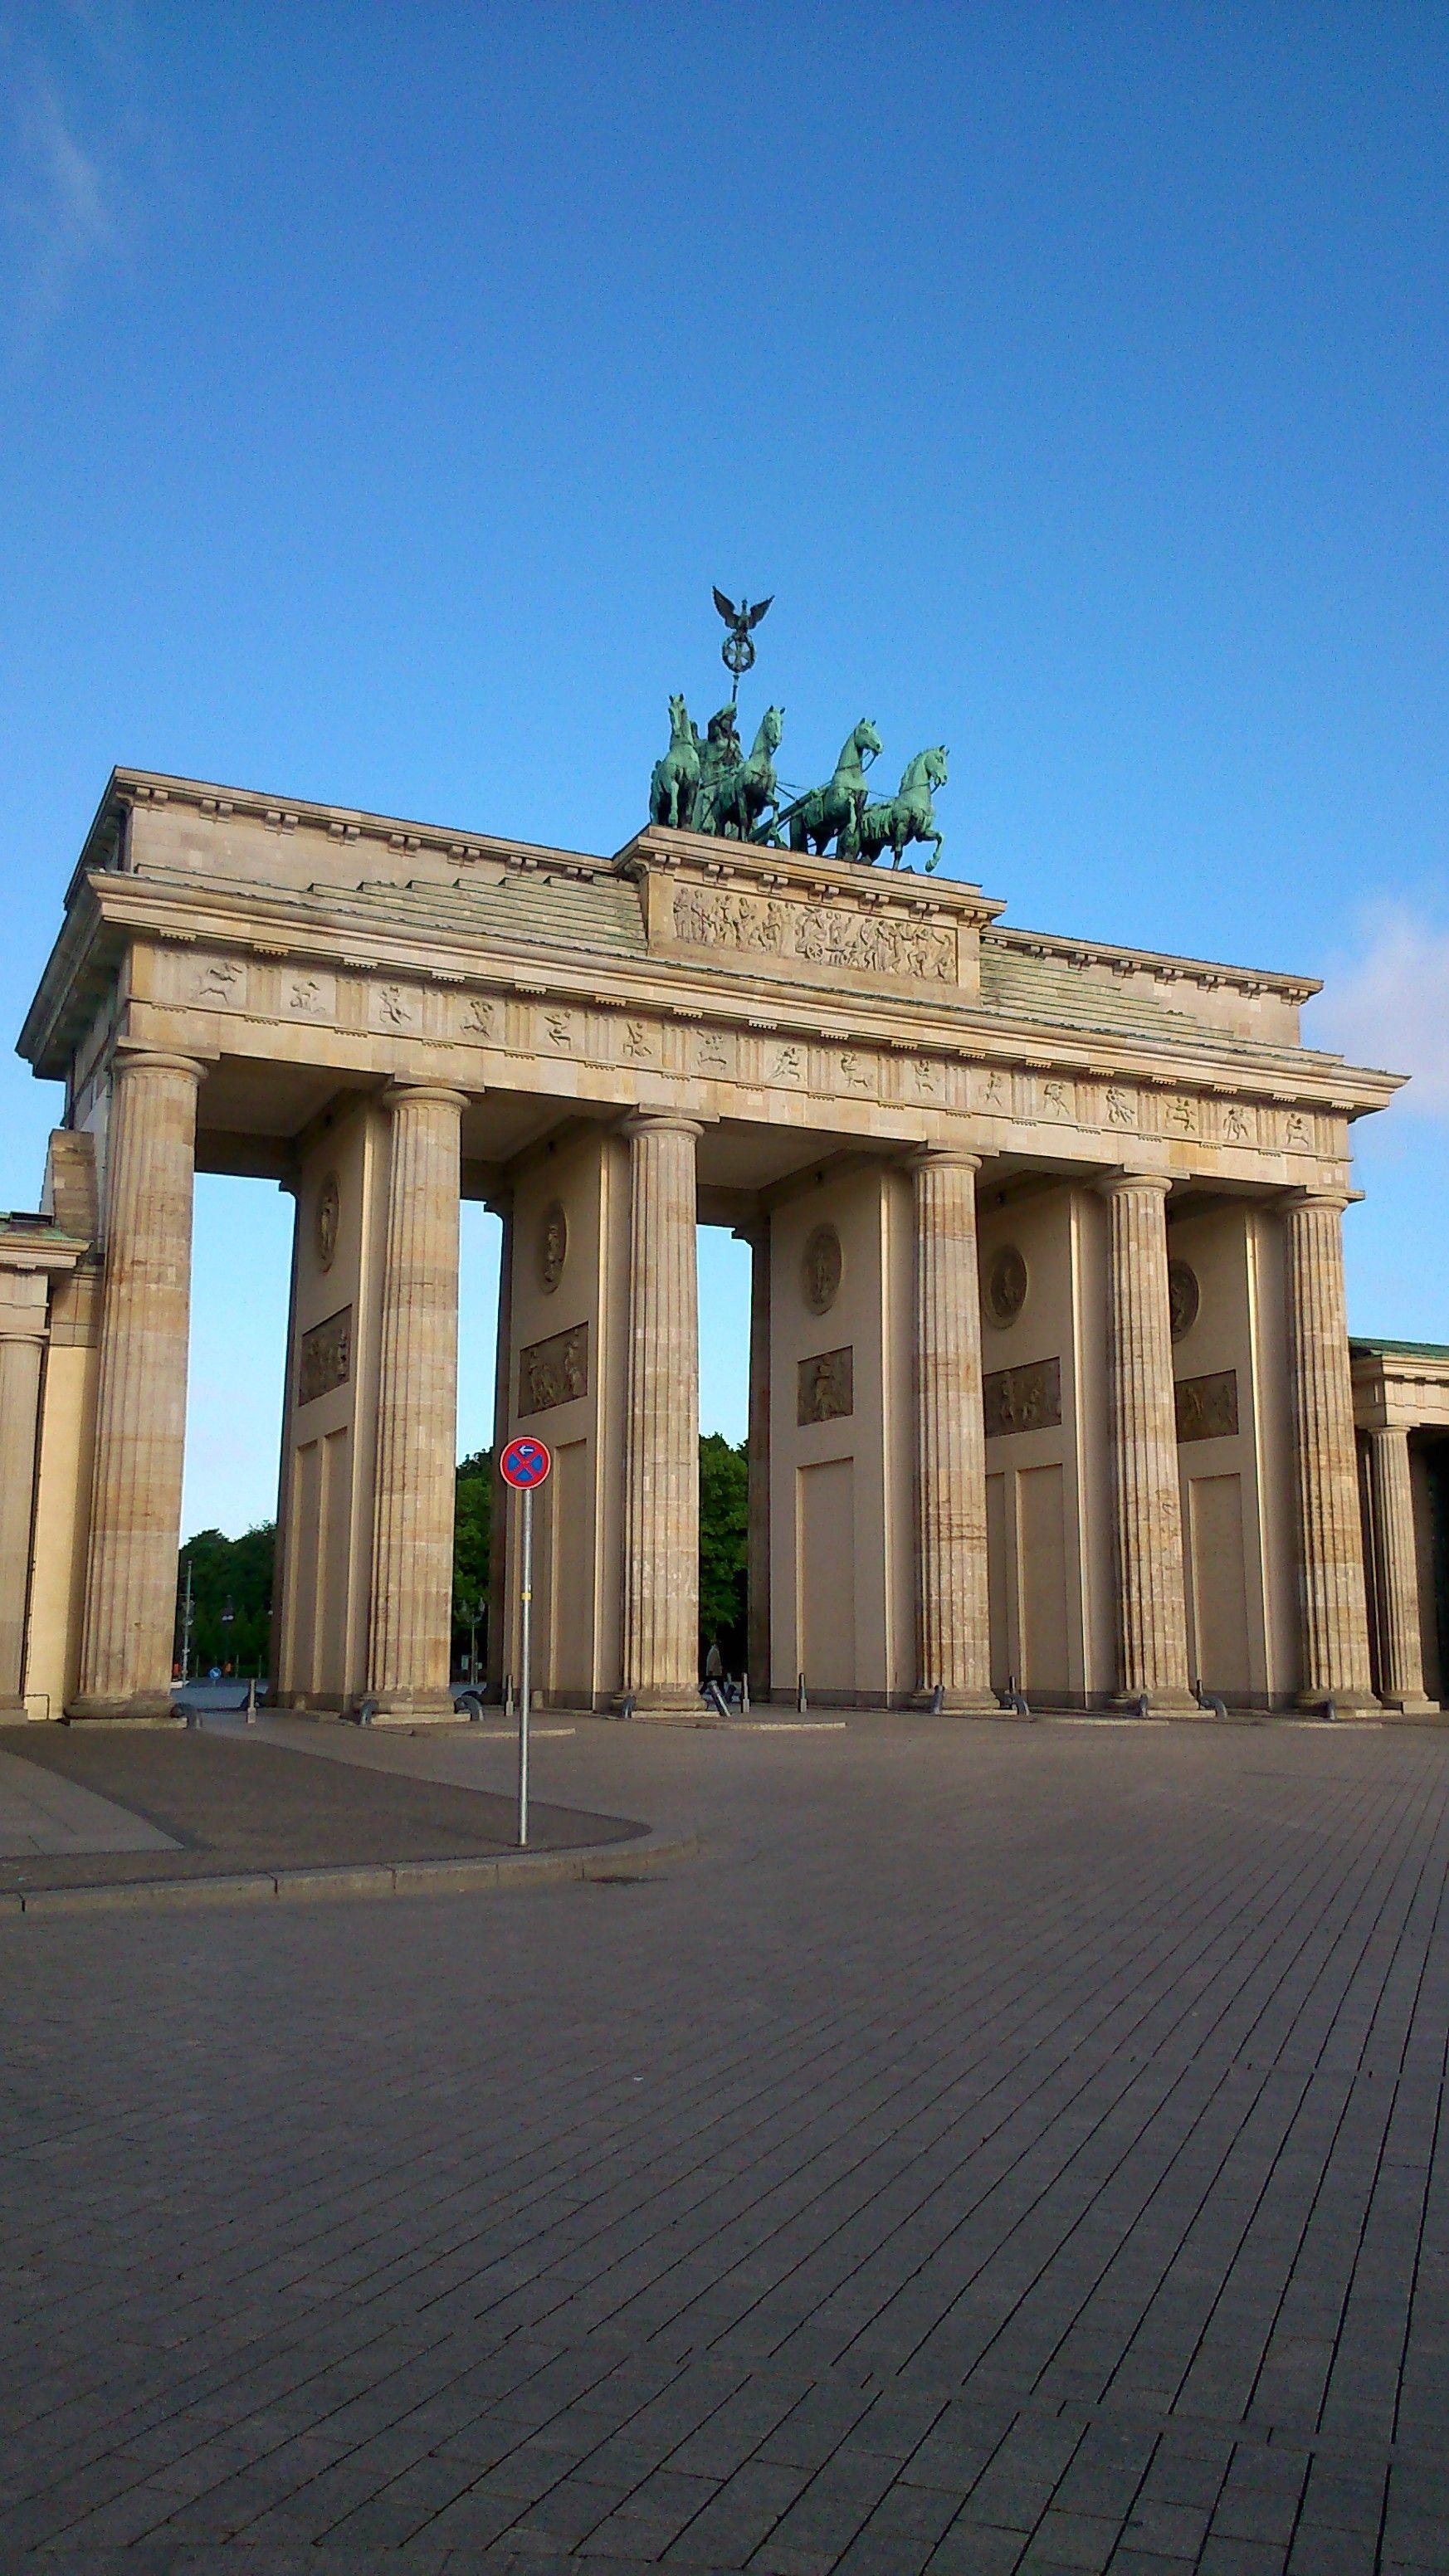 Brandenburger Tor Brandenburger Tor Berlin Brandenburger Tor Berlin